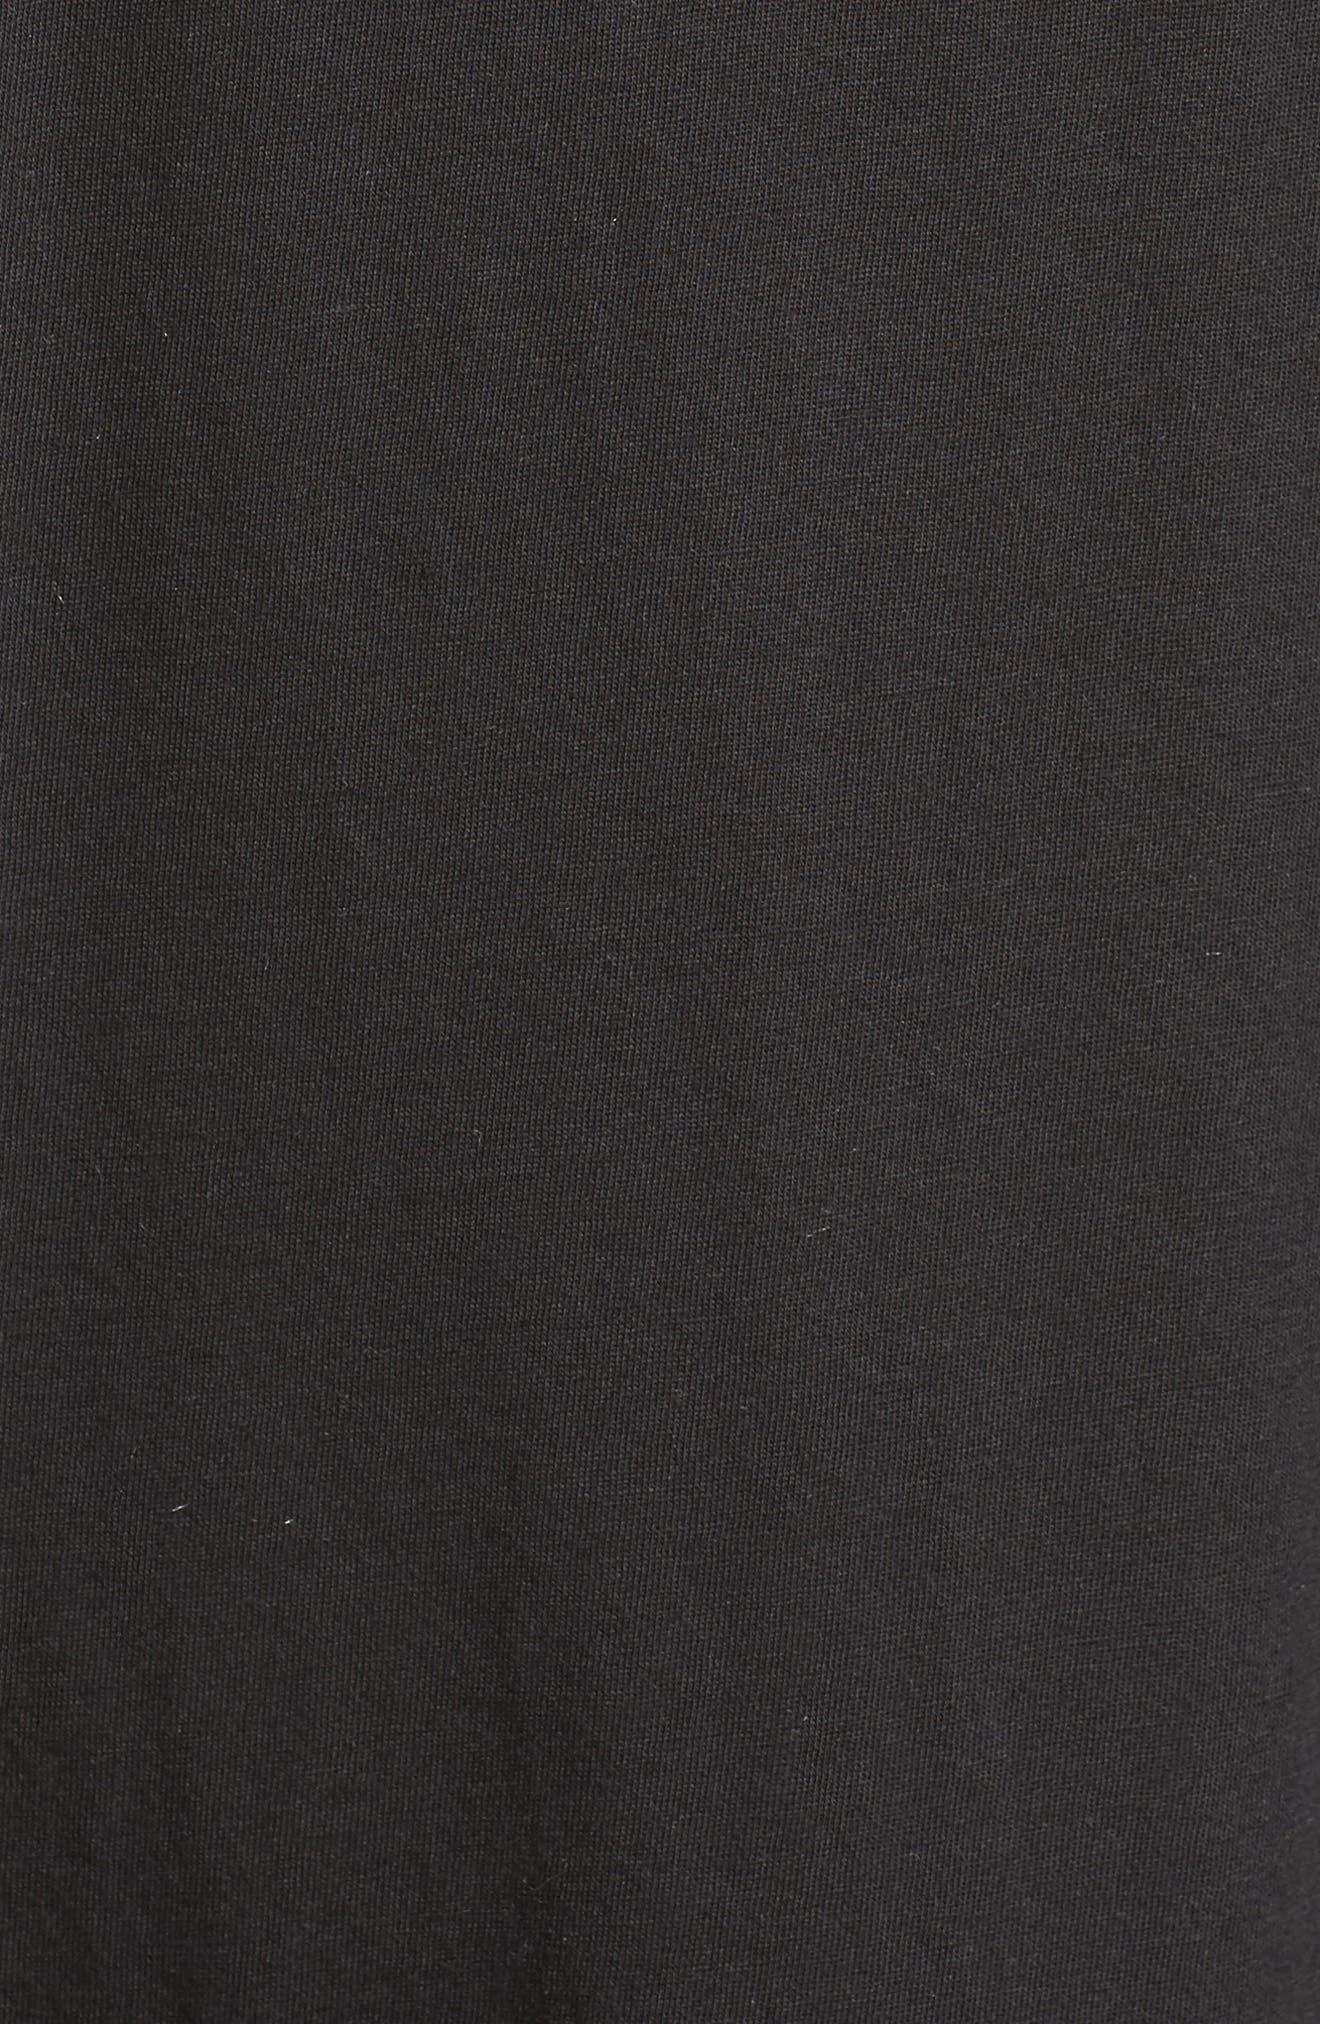 Jersey Chemise,                             Alternate thumbnail 5, color,                             001